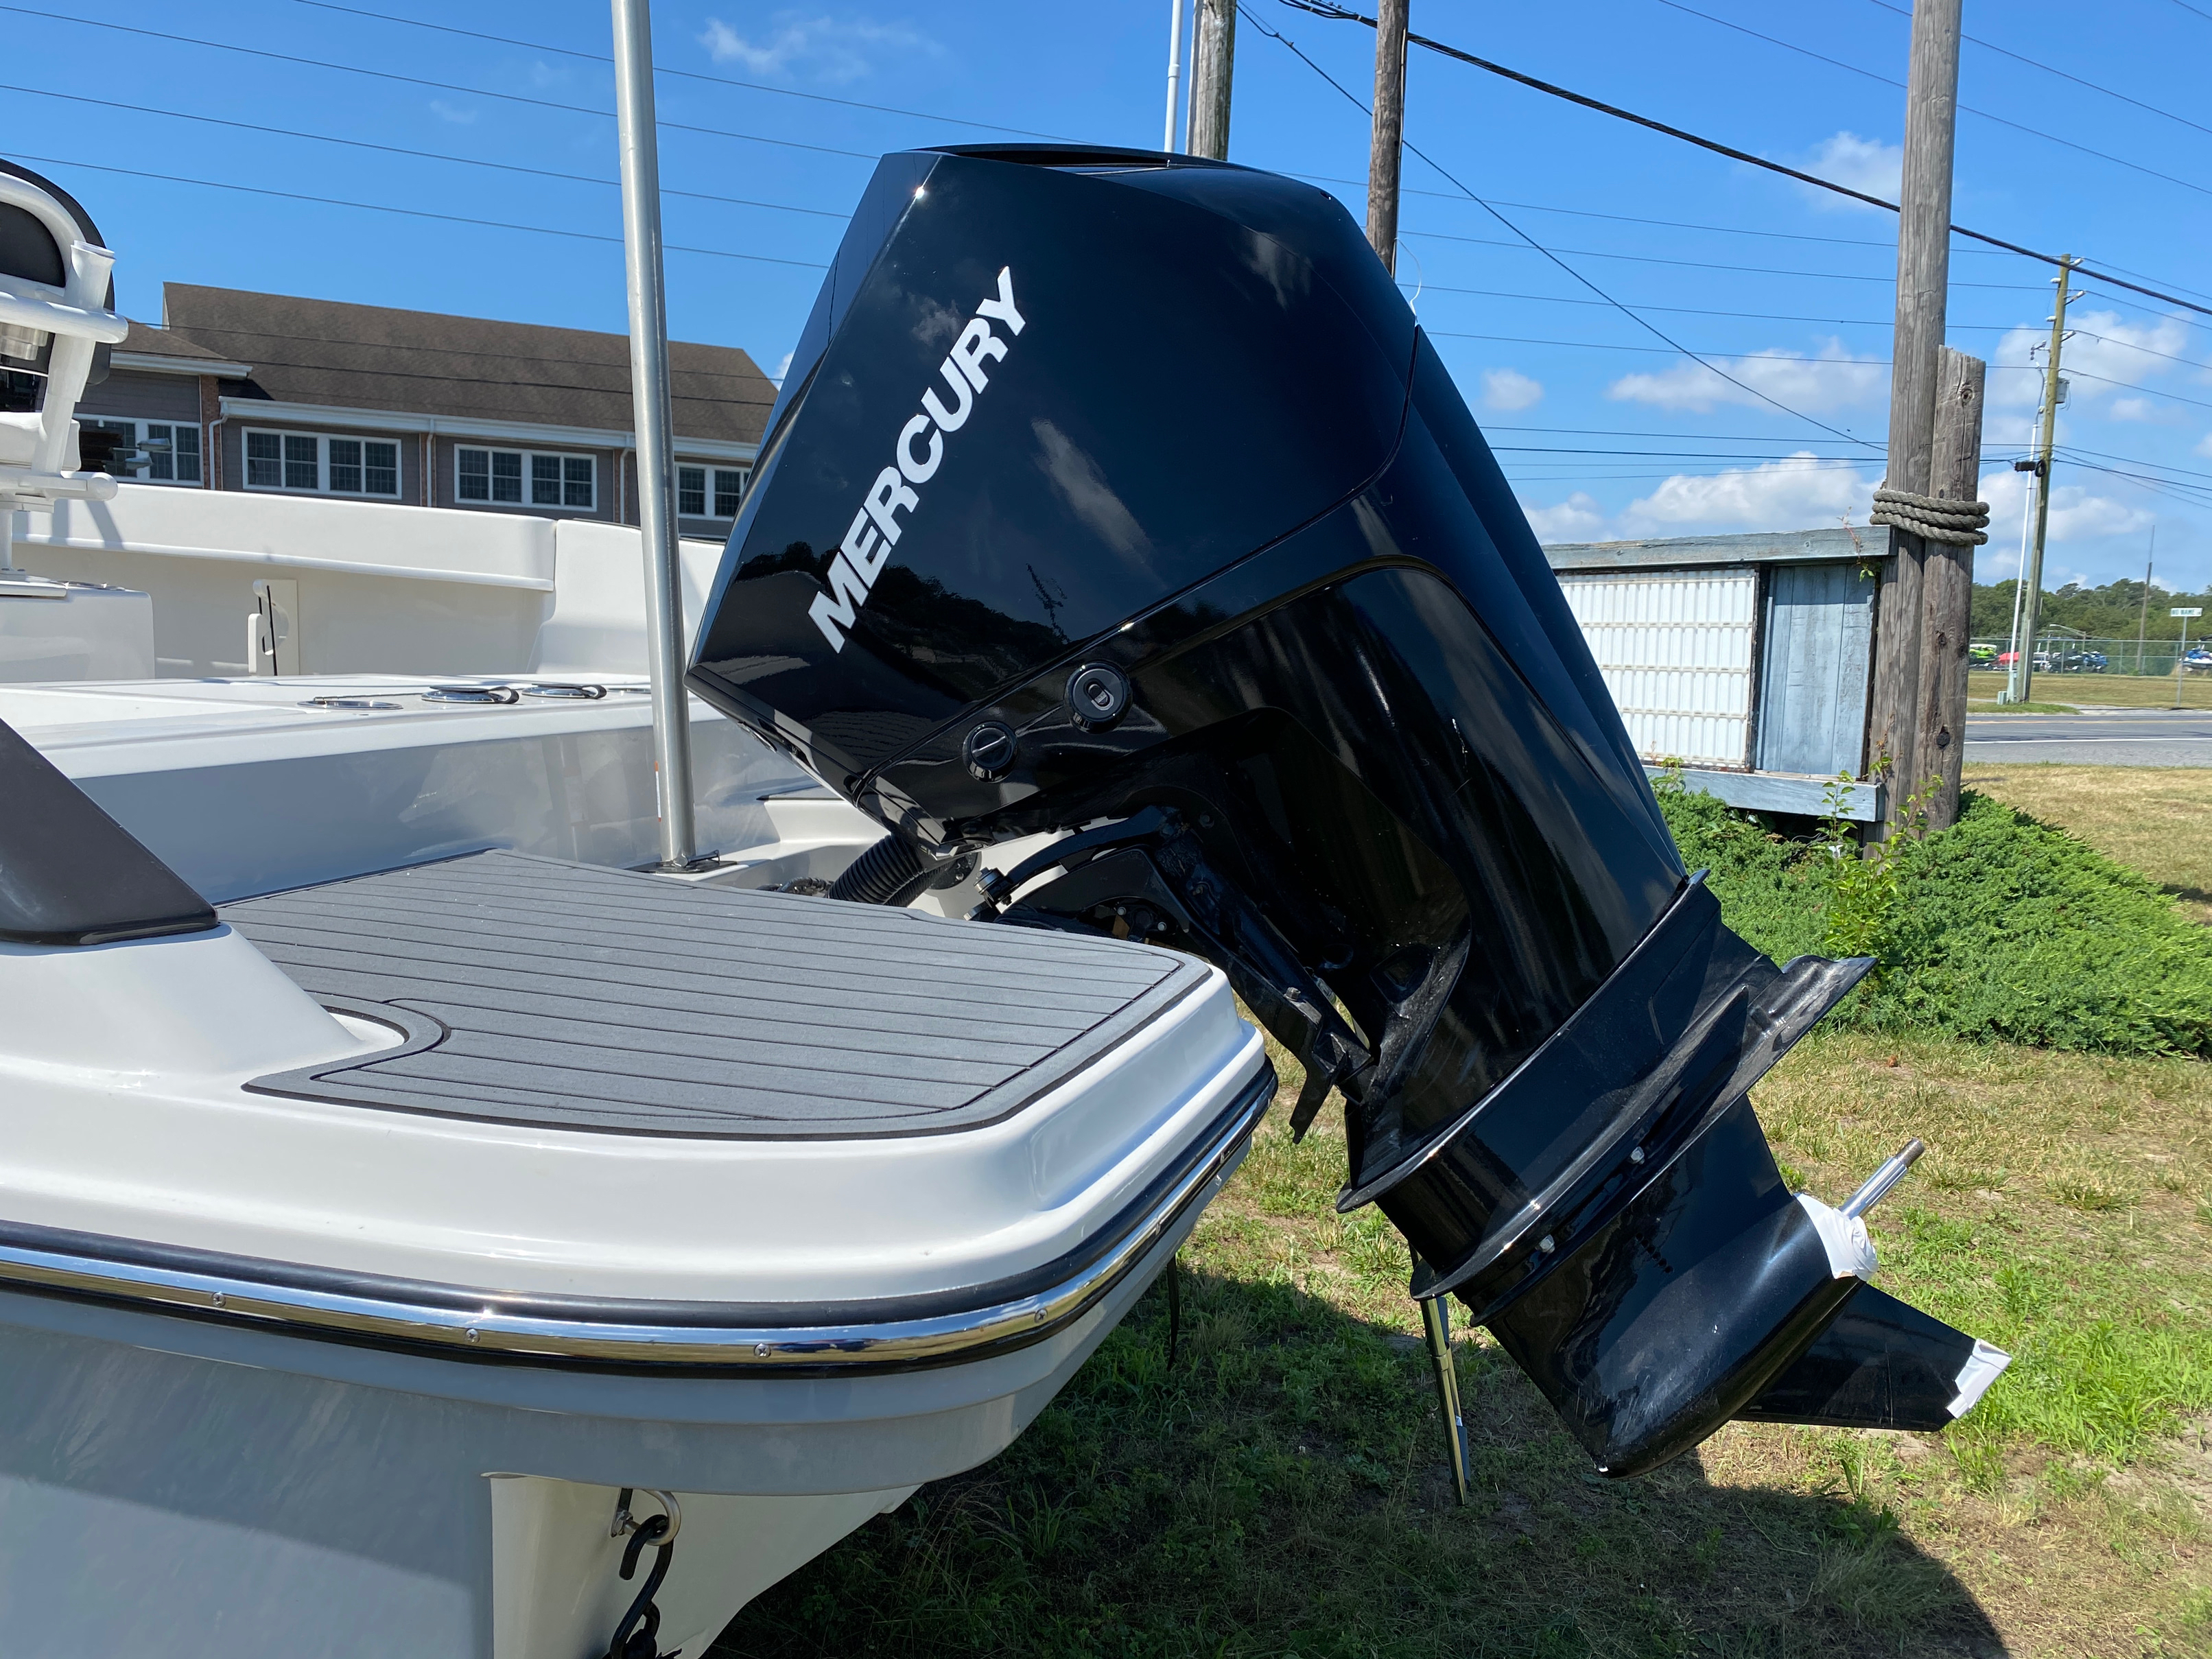 2020 Bayliner boat for sale, model of the boat is Trophy 22CC & Image # 15 of 17